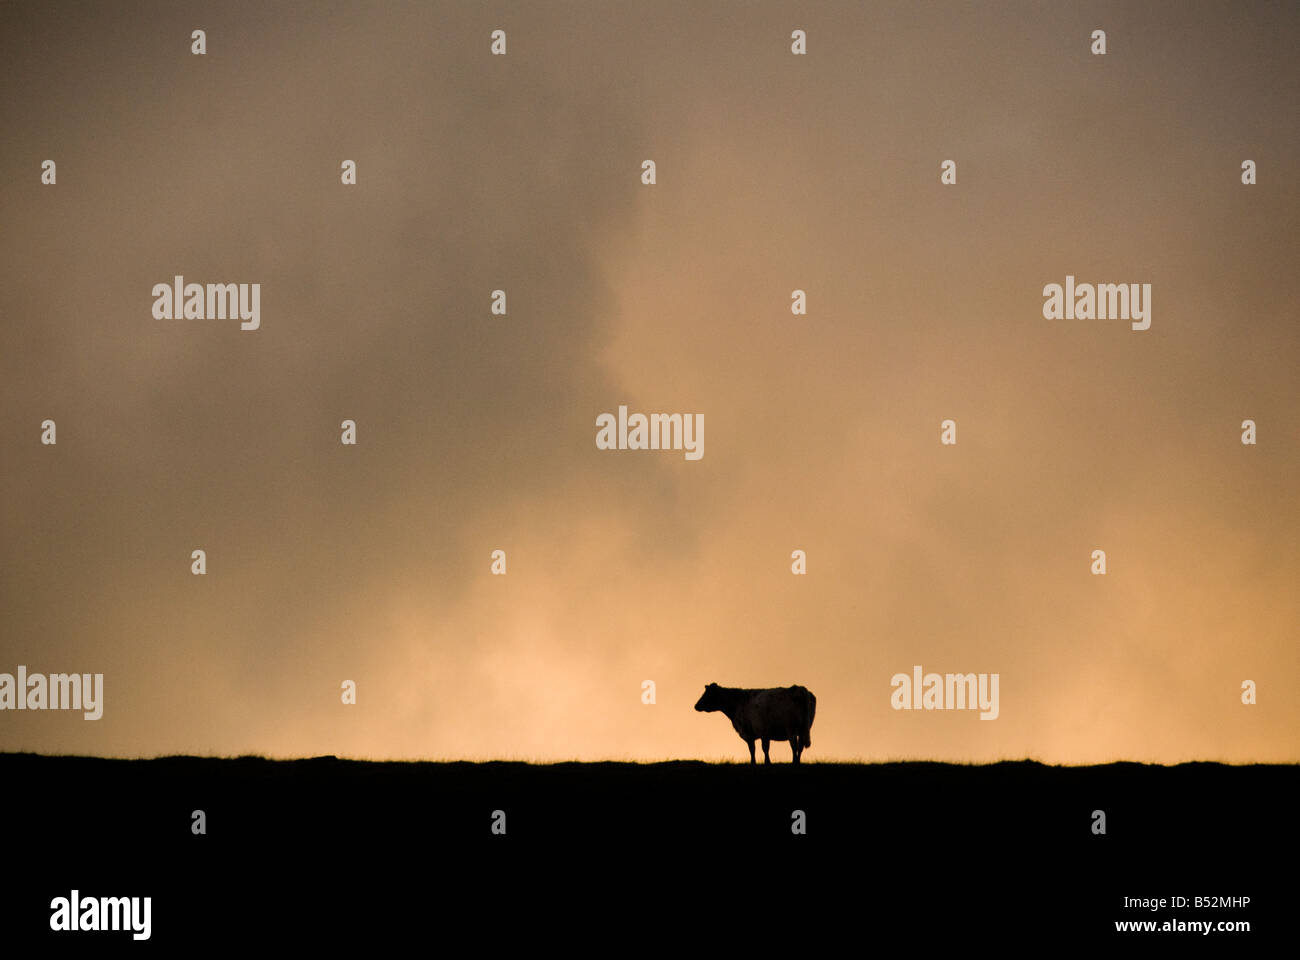 Silueta de la vaca Imagen De Stock